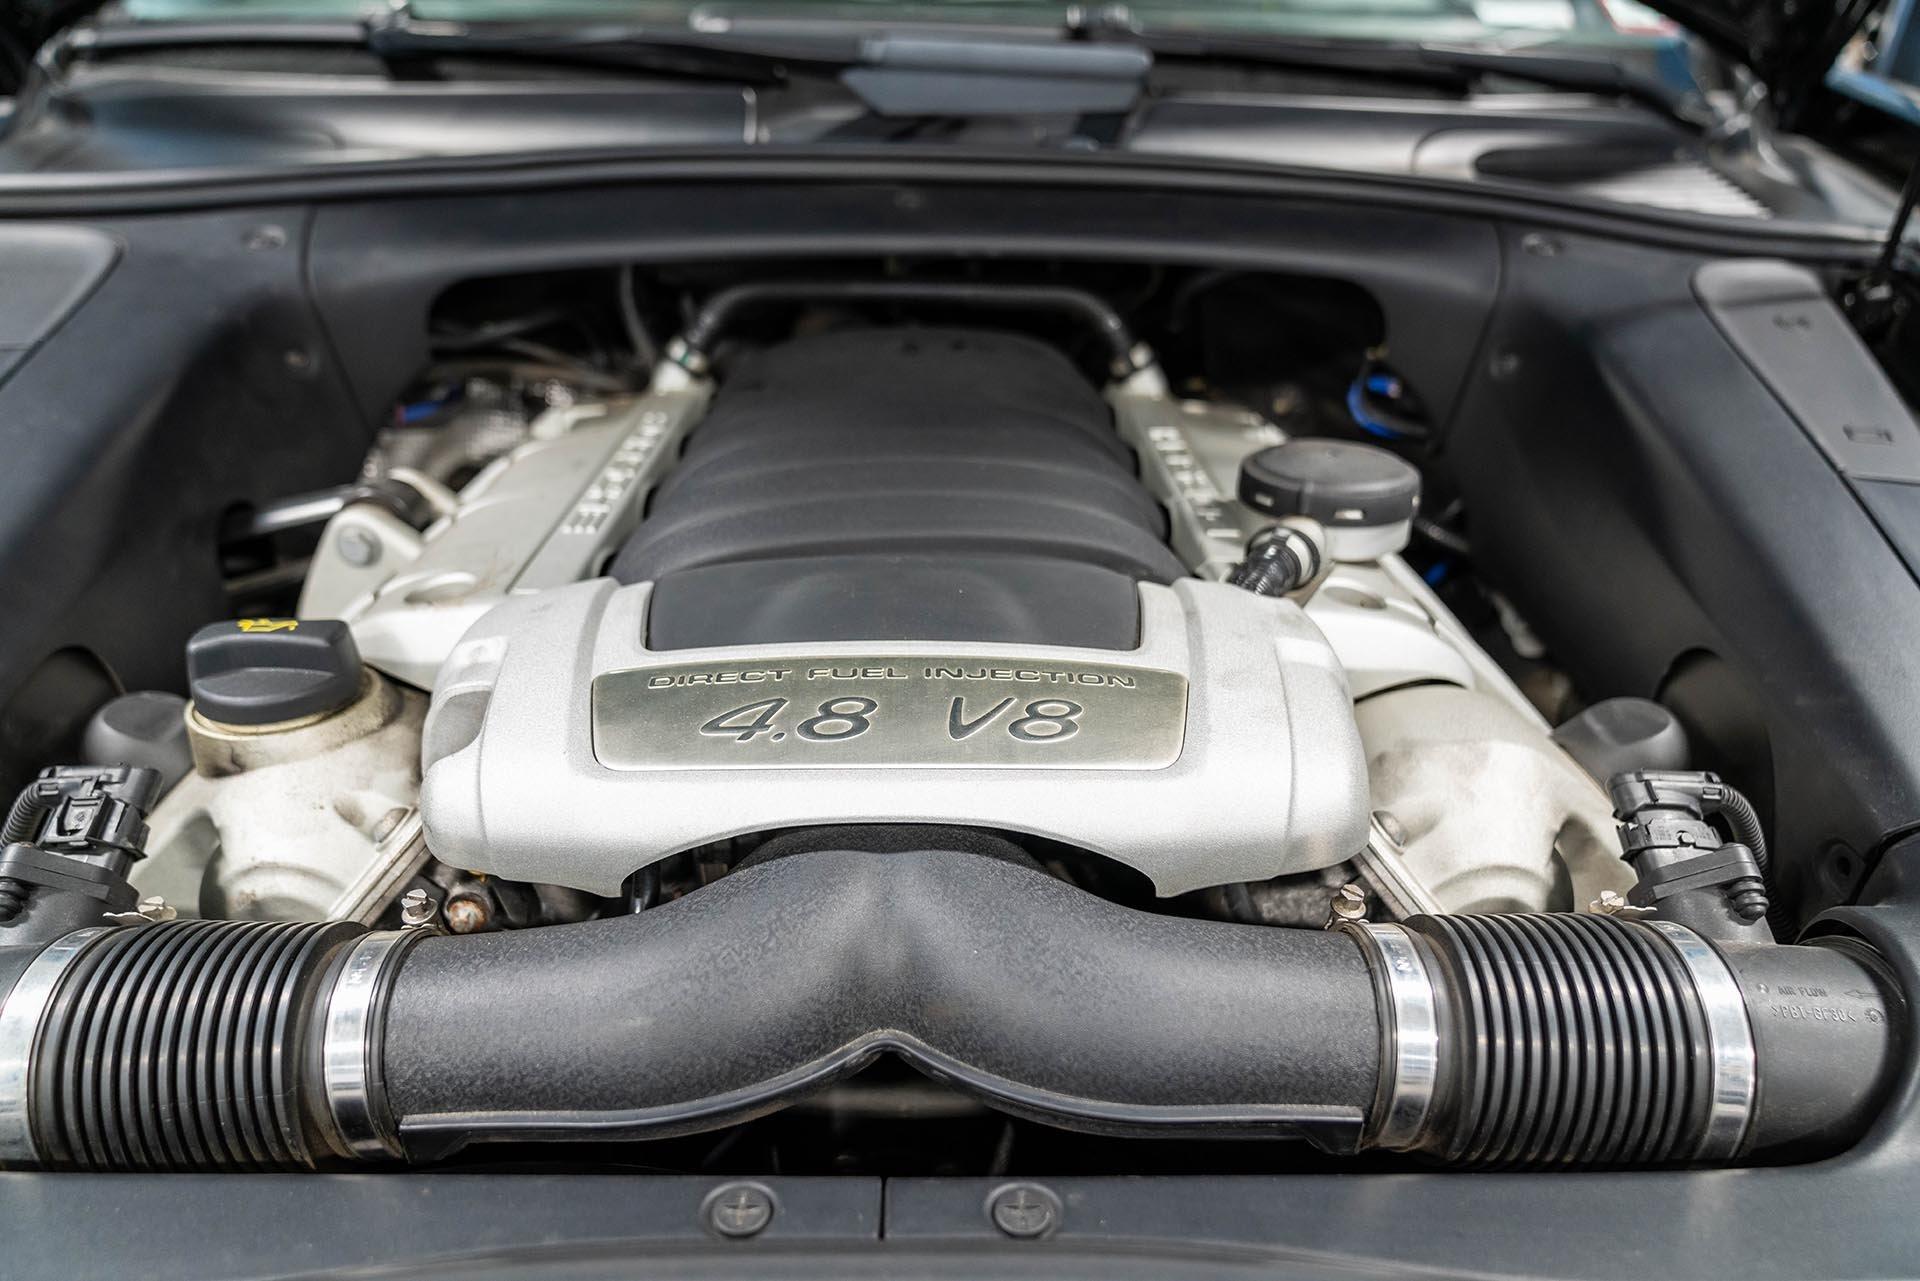 04_Porsche 957 cayenne GTS 4.8 V8 Engine Bay